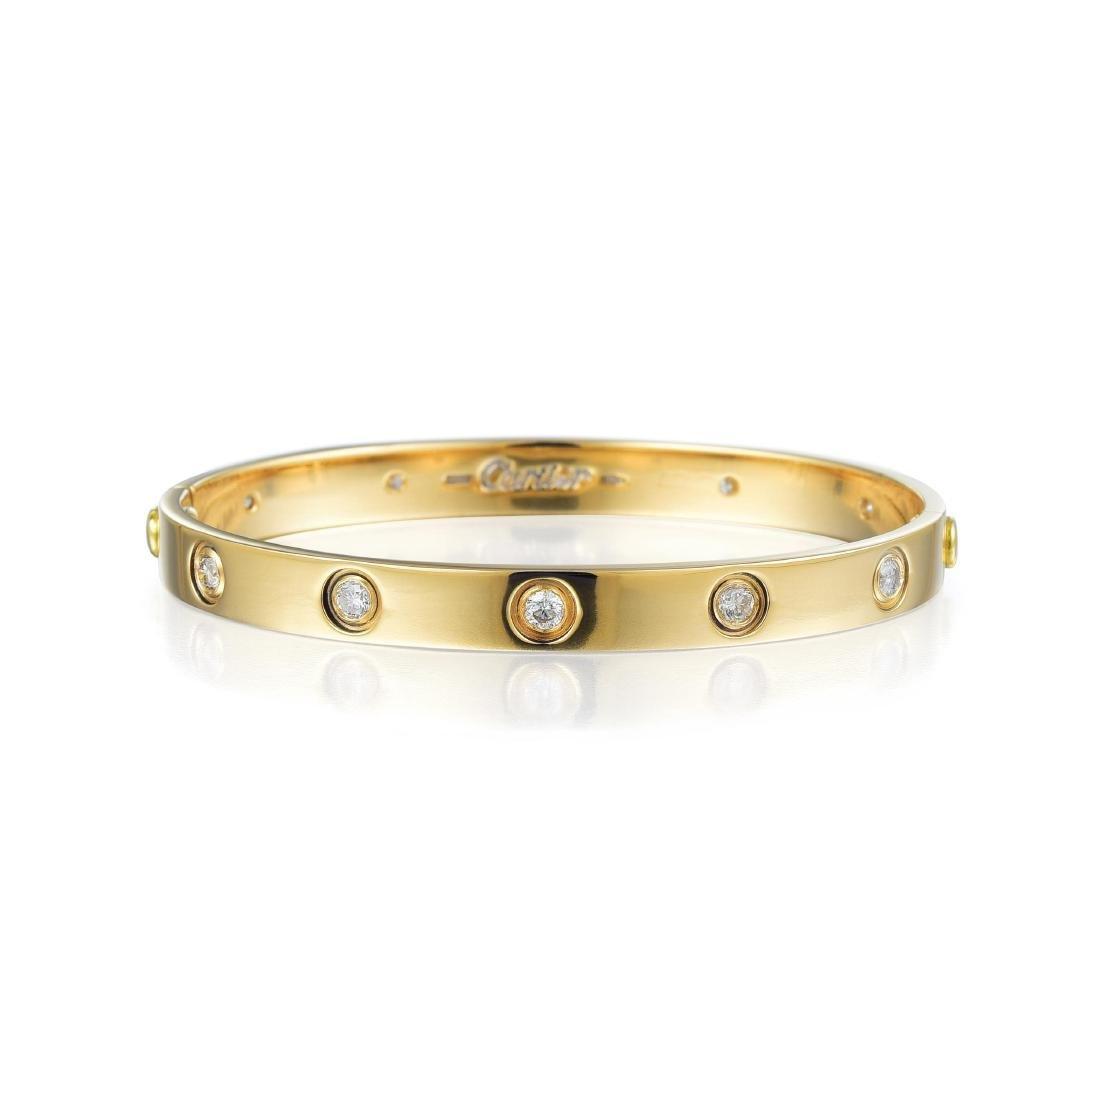 Cartier Diamond and Gold Love Bracelet